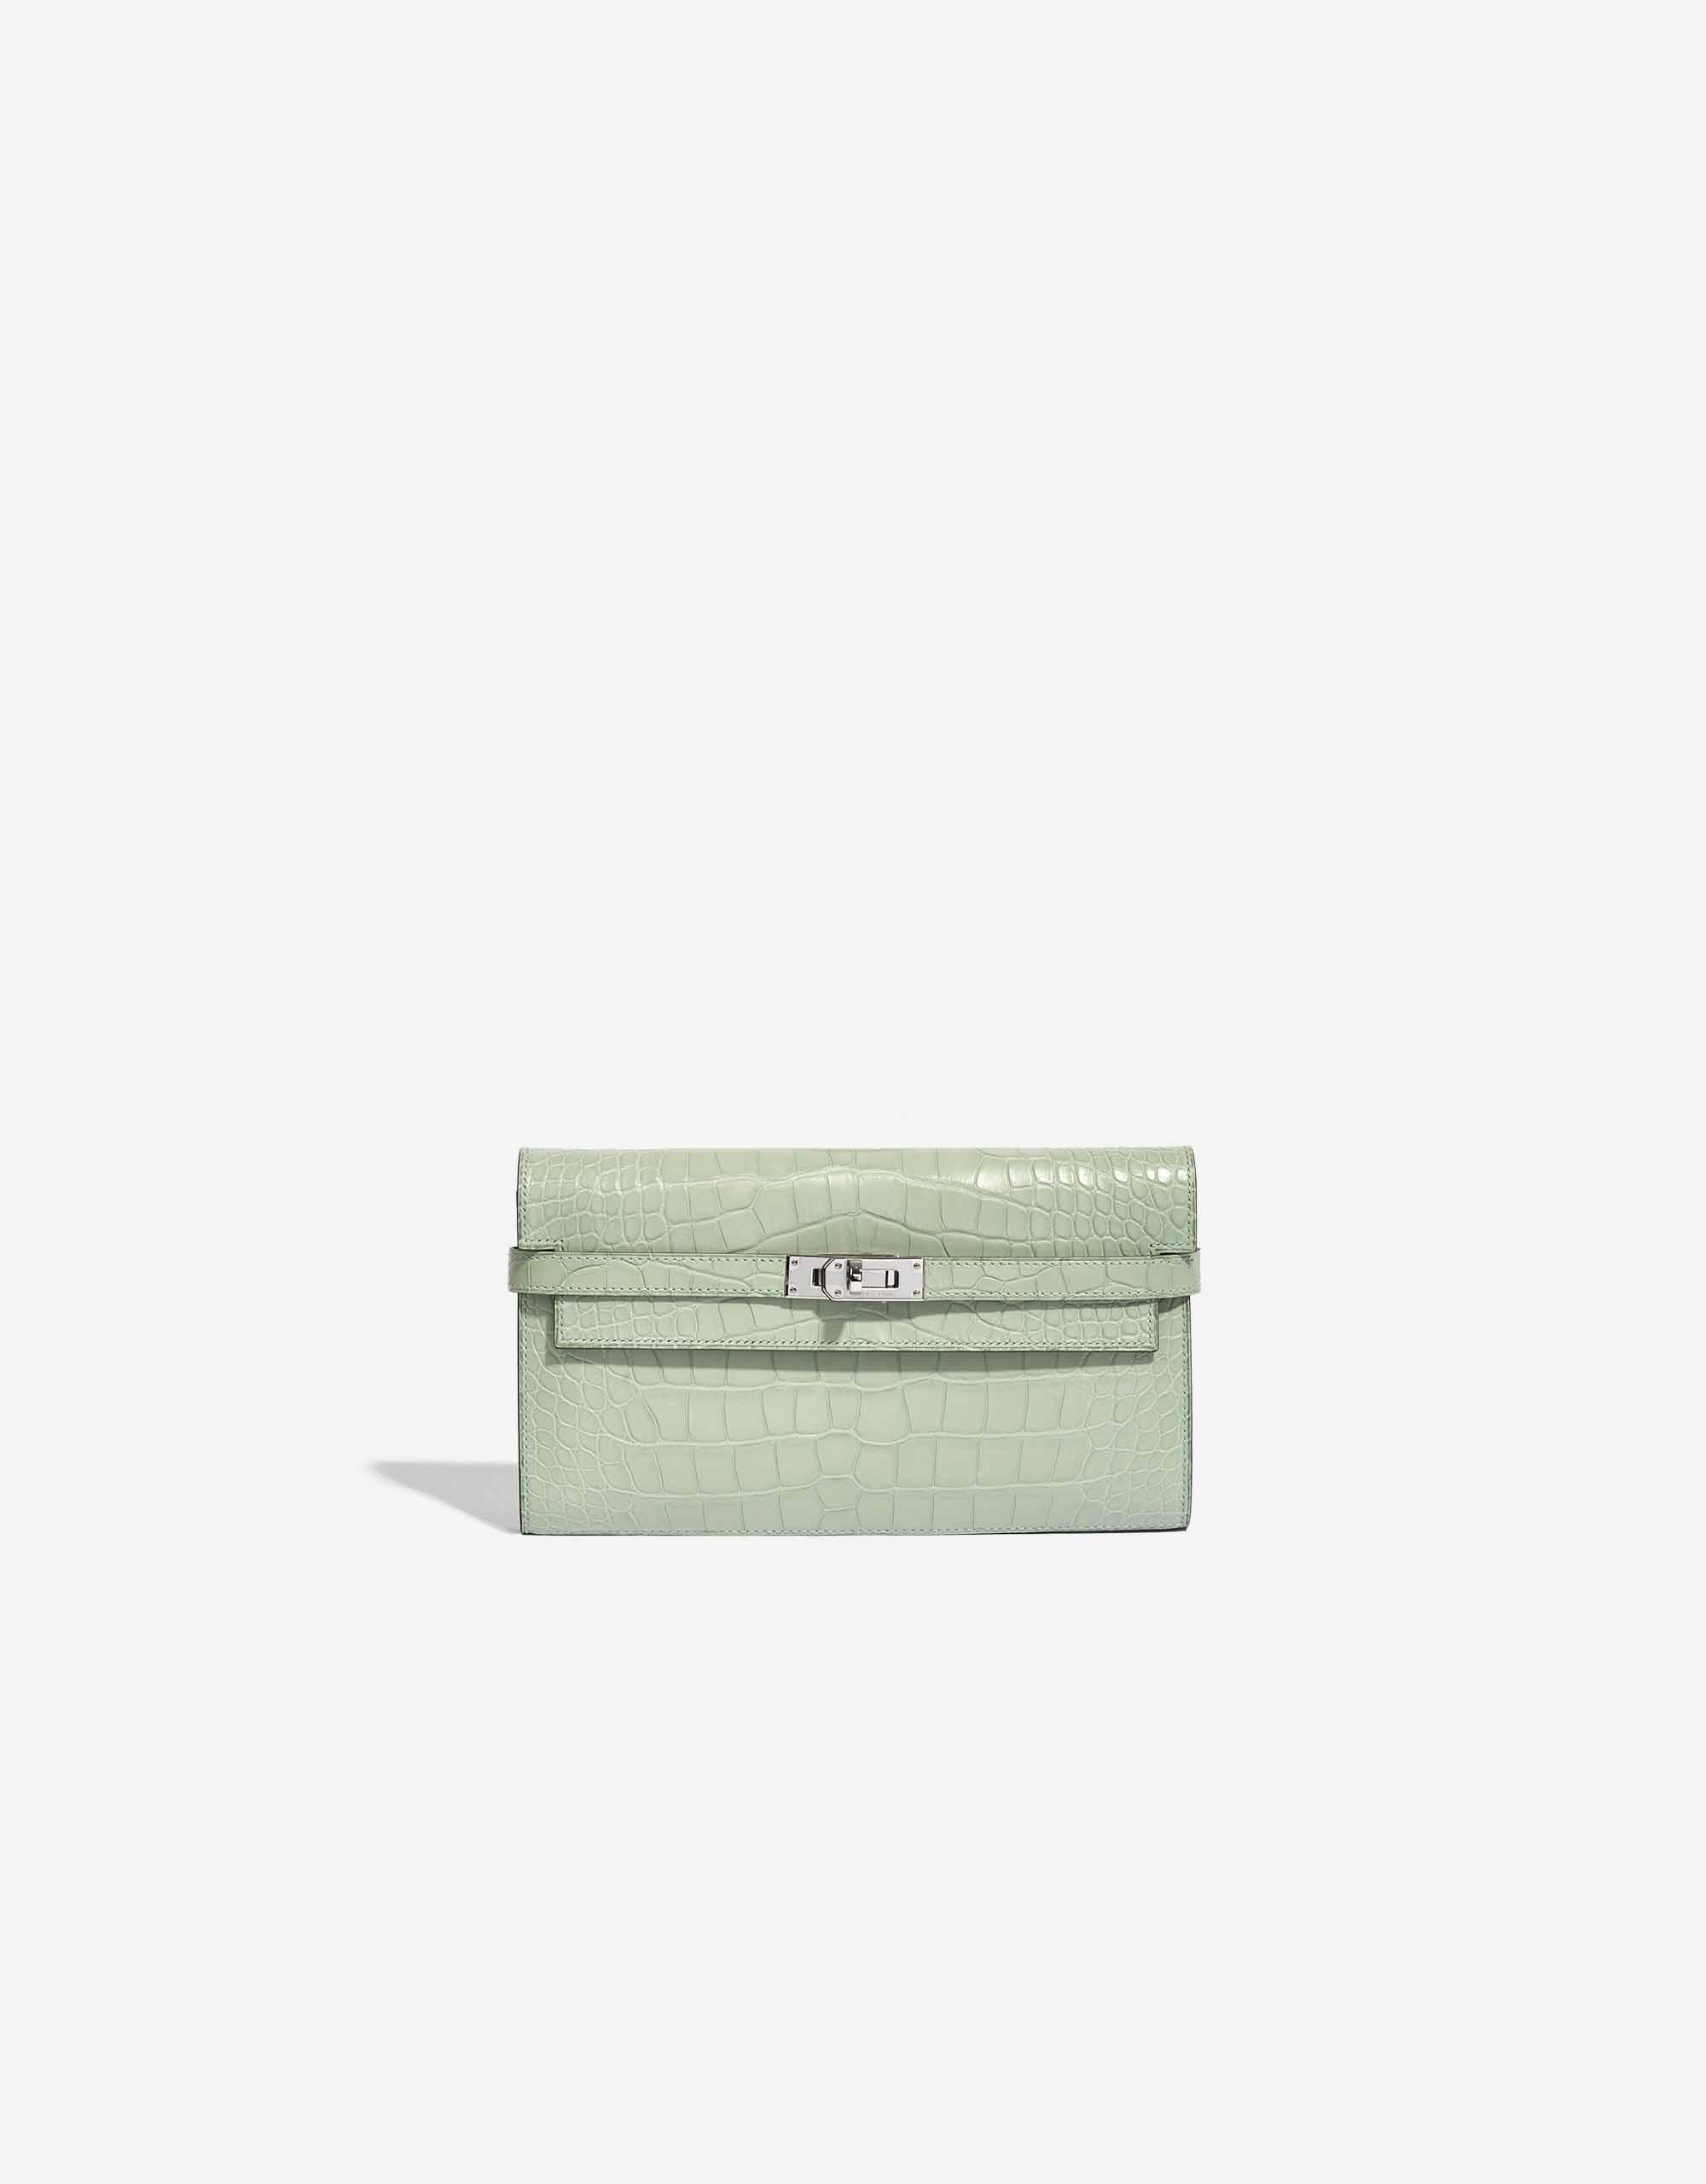 Hermès Kelly Long Wallet Alligator Matte Vert D'Eau | SACLÀB